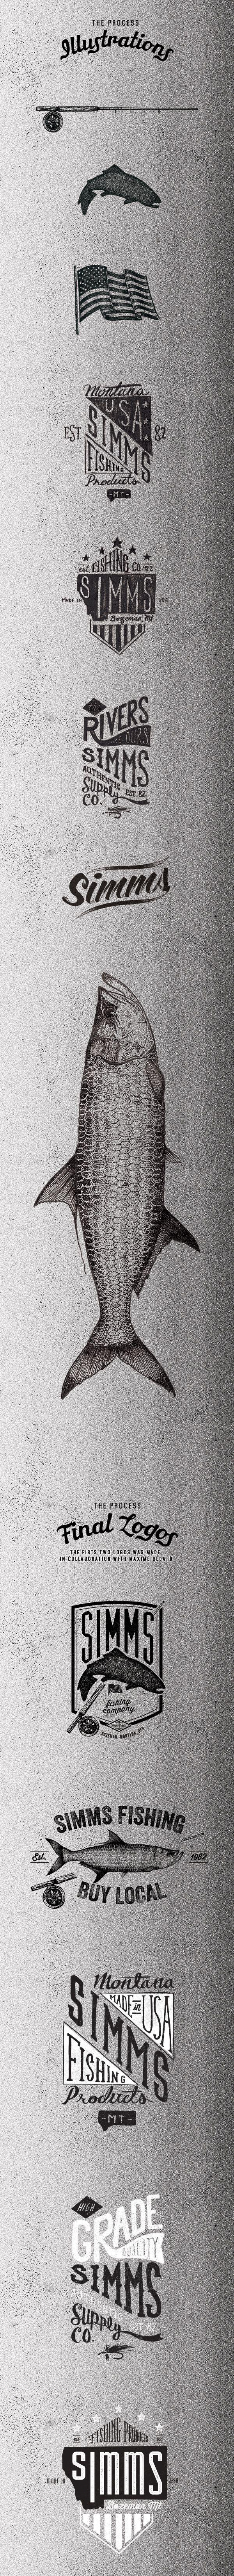 Simms Fishing Clothing Logos 2015